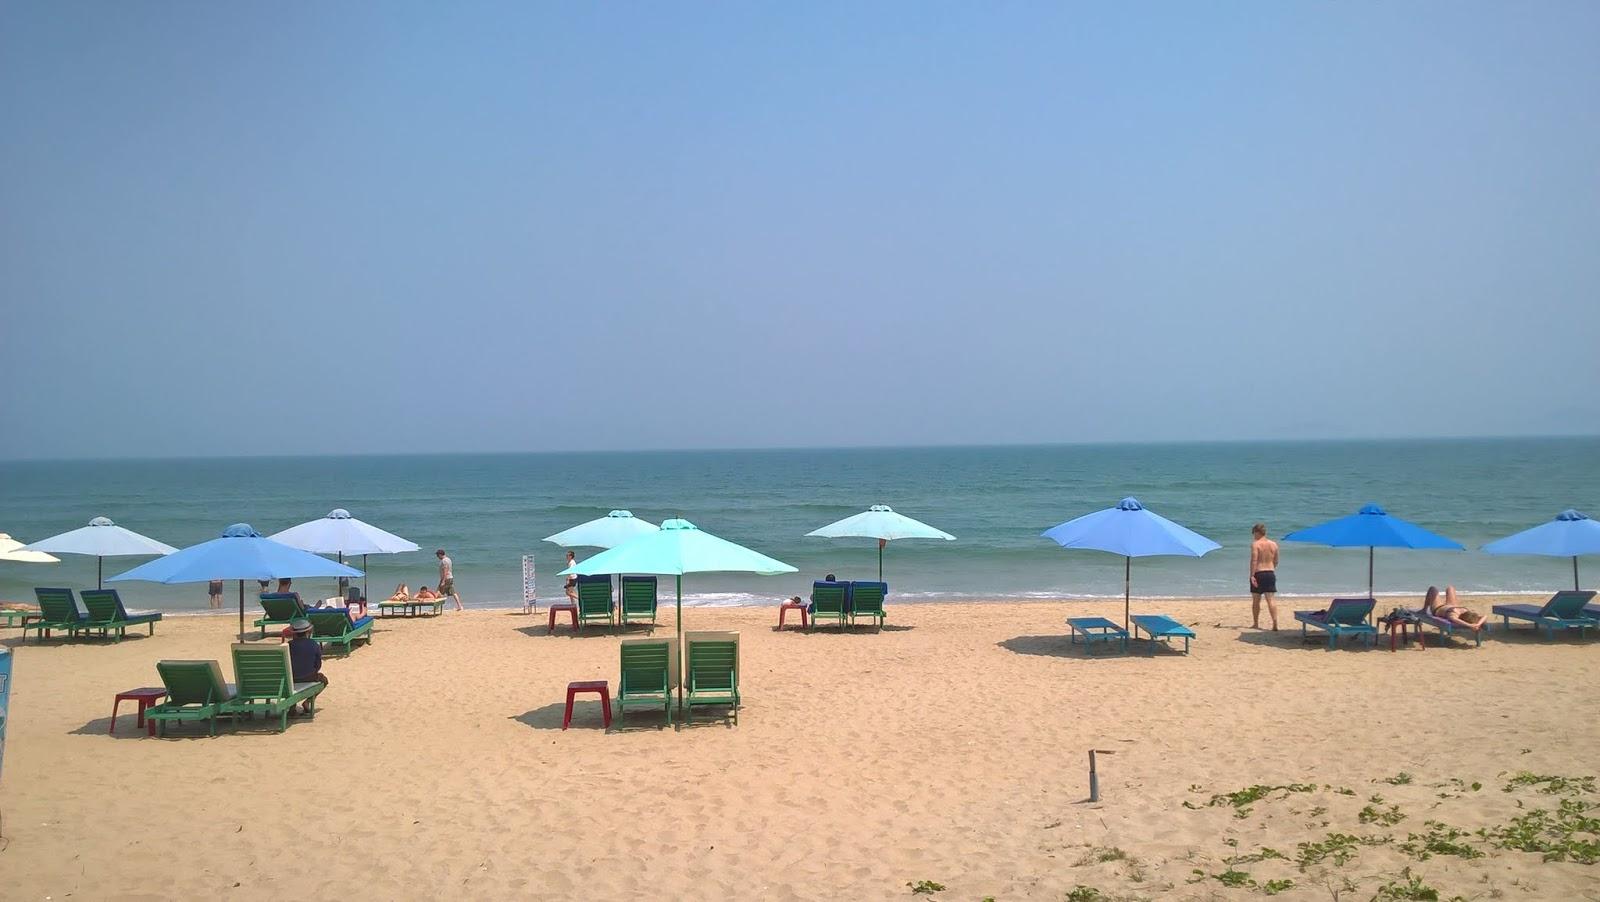 Пляжи Хойана. Какова реальная ситуация?